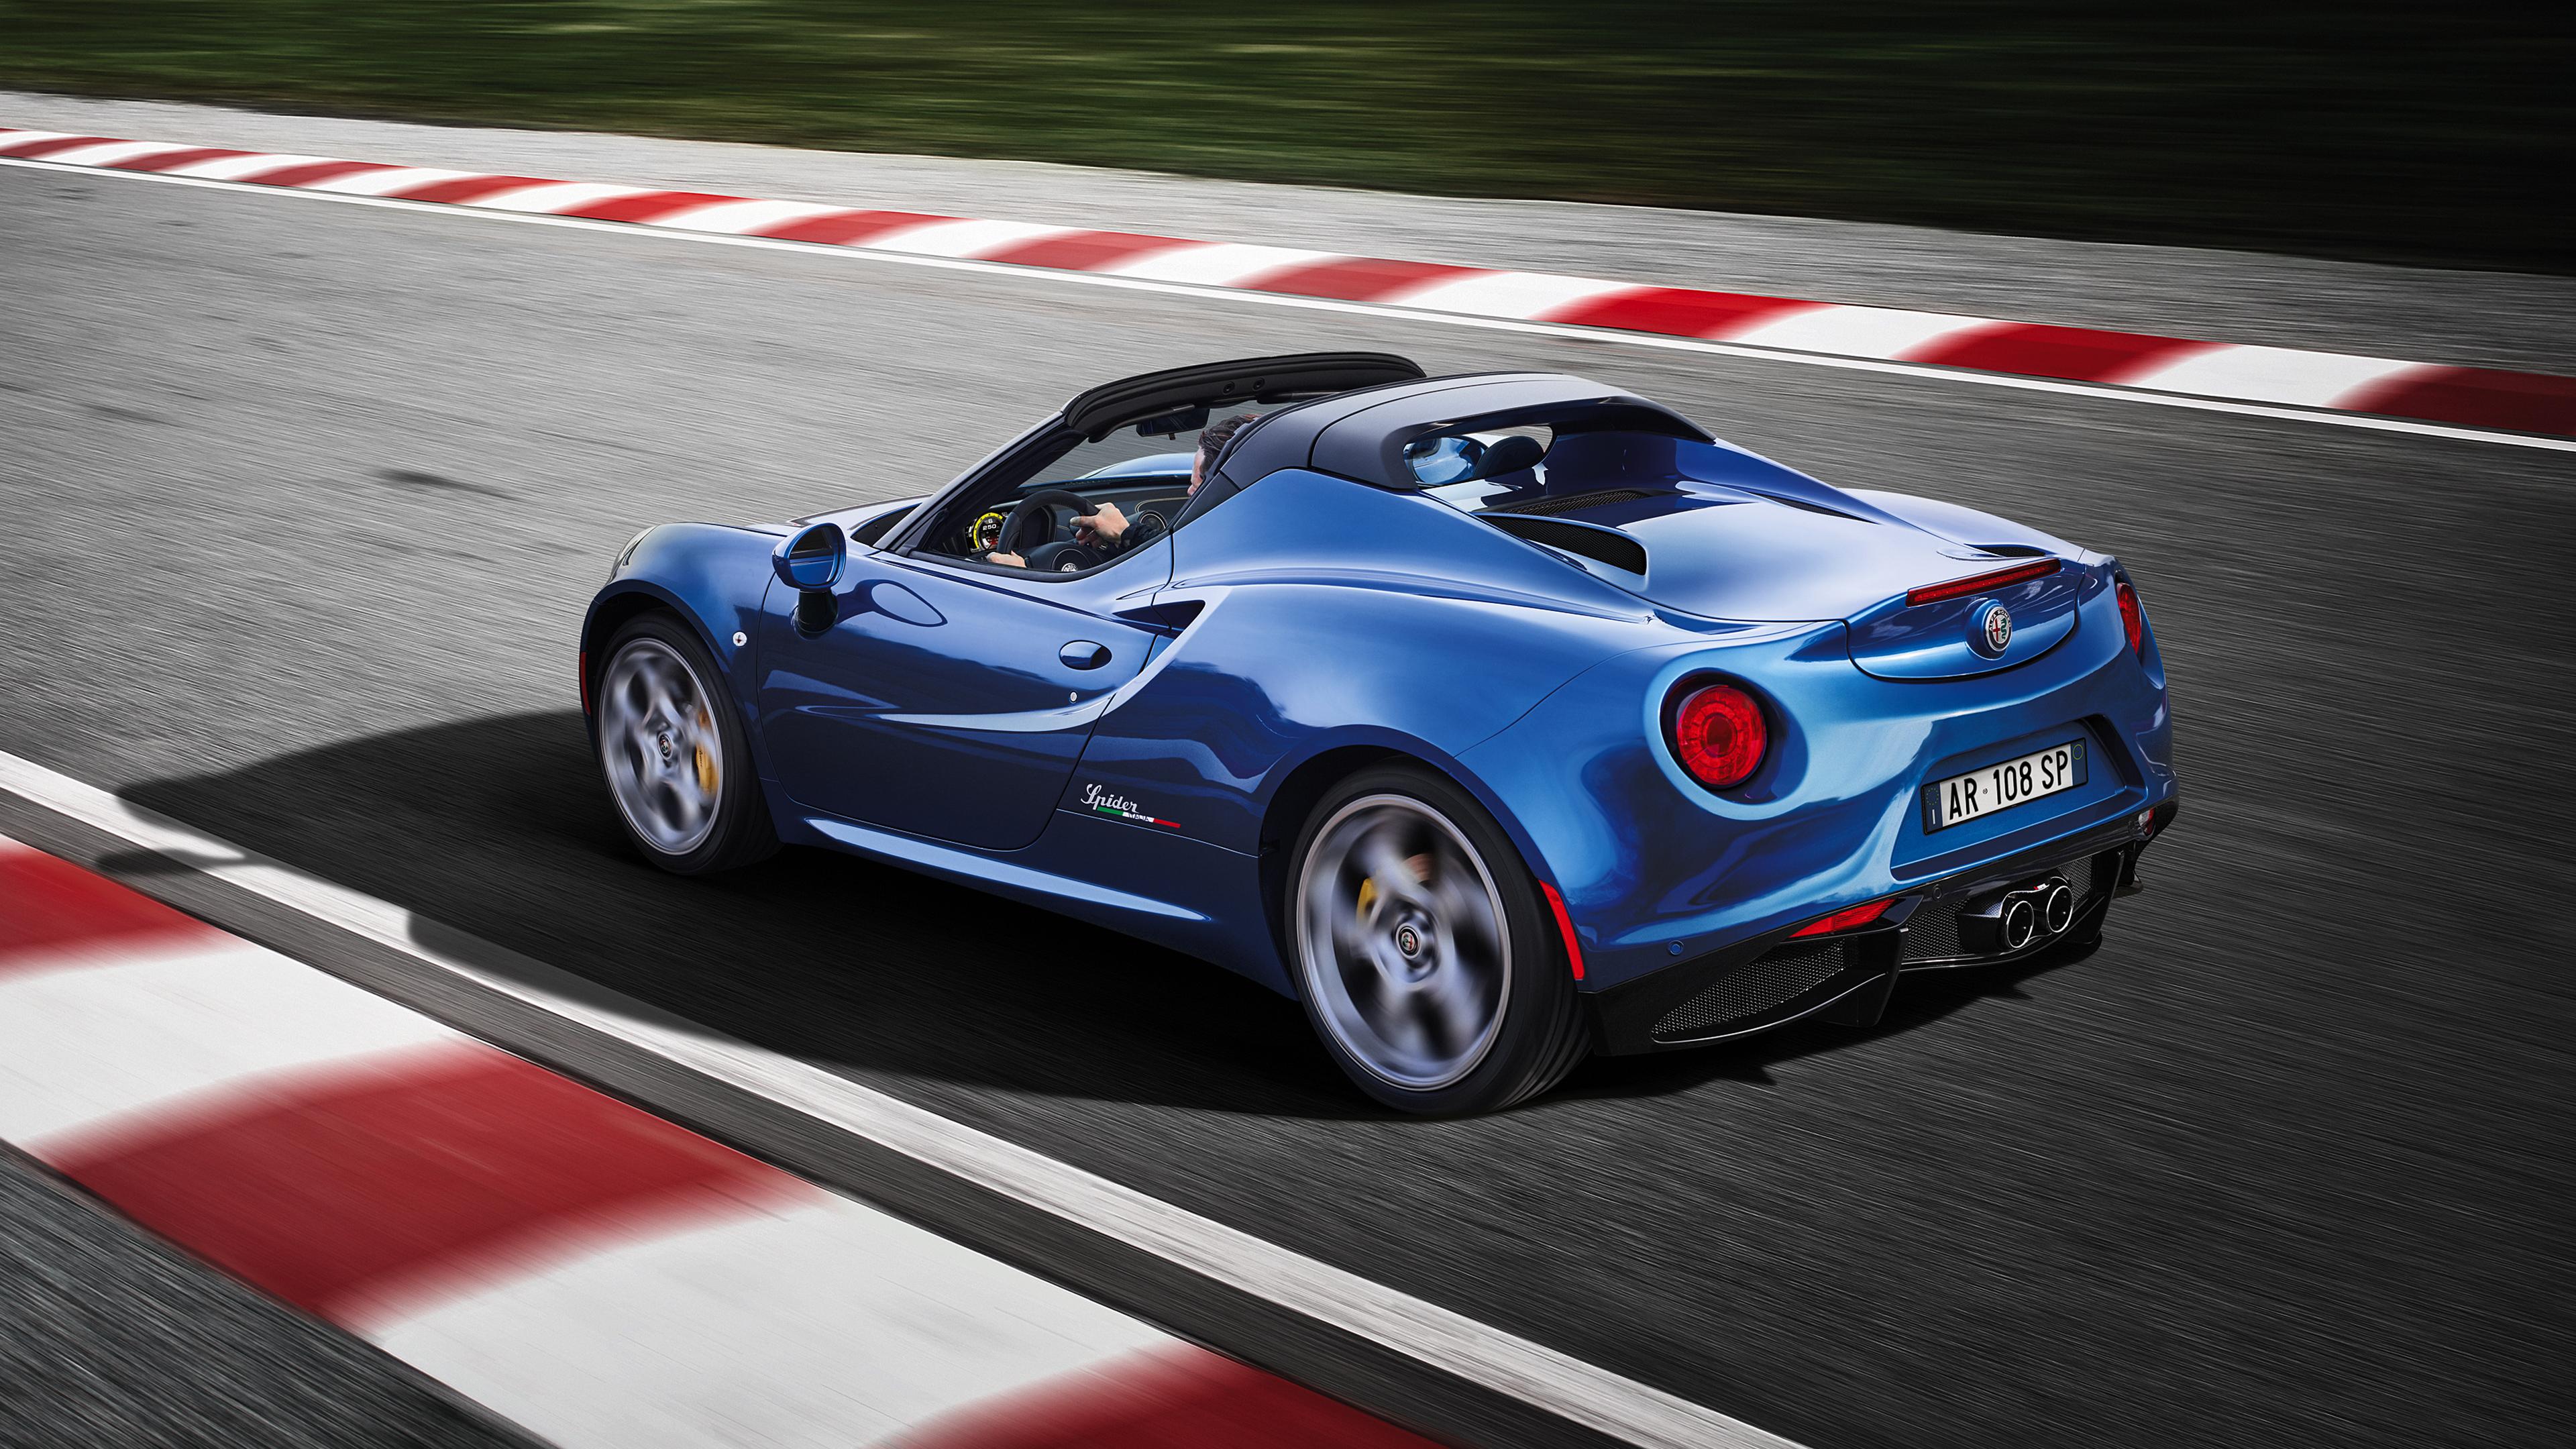 2018 Alfa Romeo 4c Spider Italia 4k 2 Wallpaper Hd Car